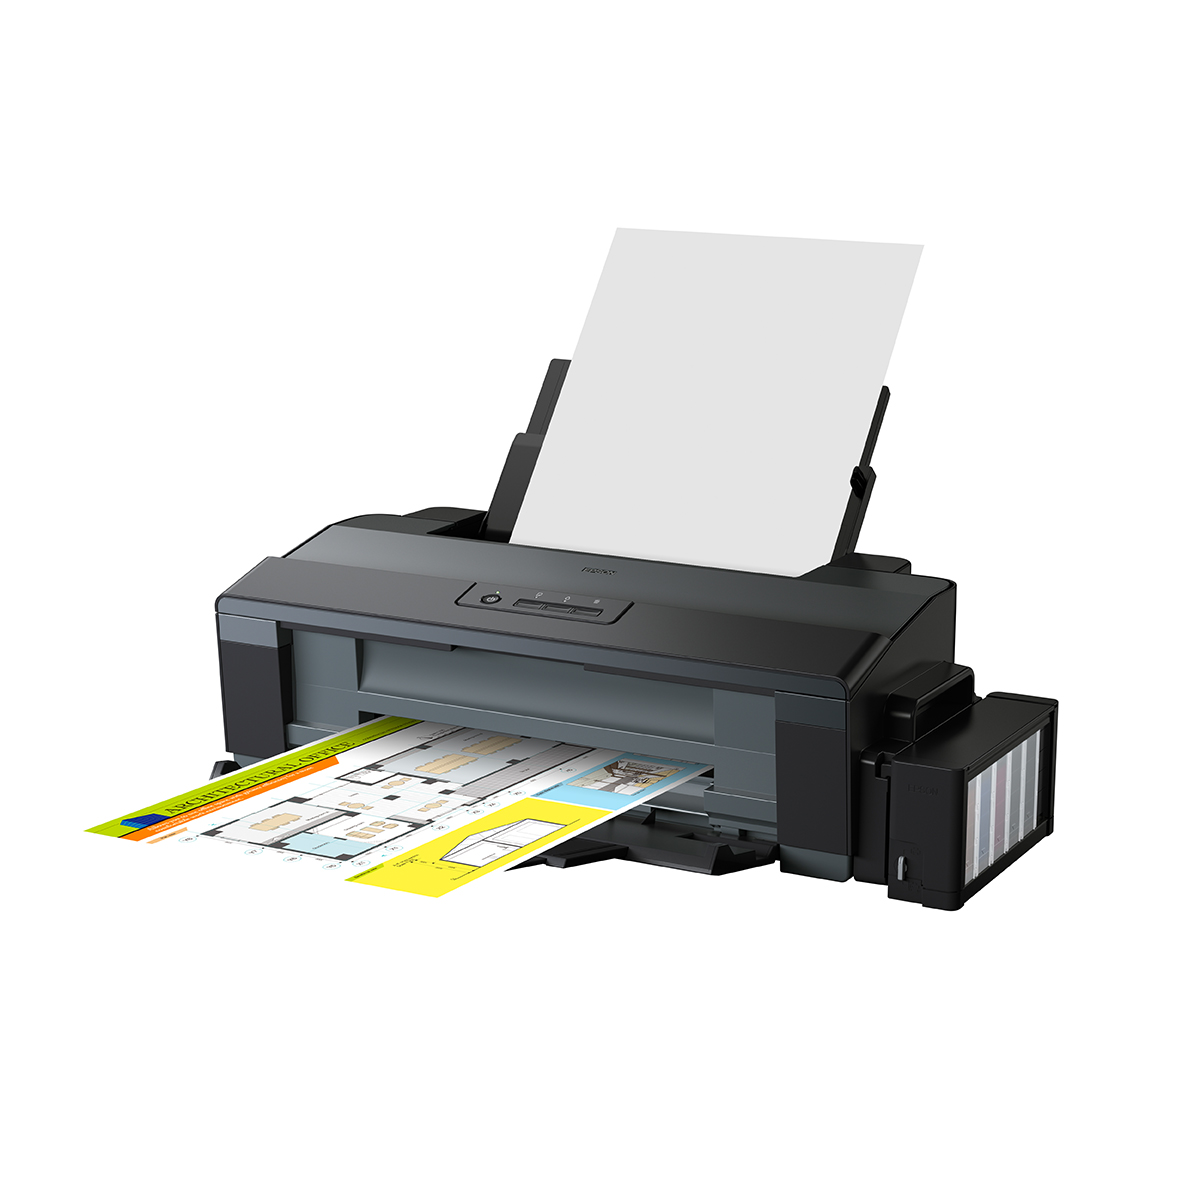 Epson EcoTank ET-14000 A3 Colour Inkjet Printer